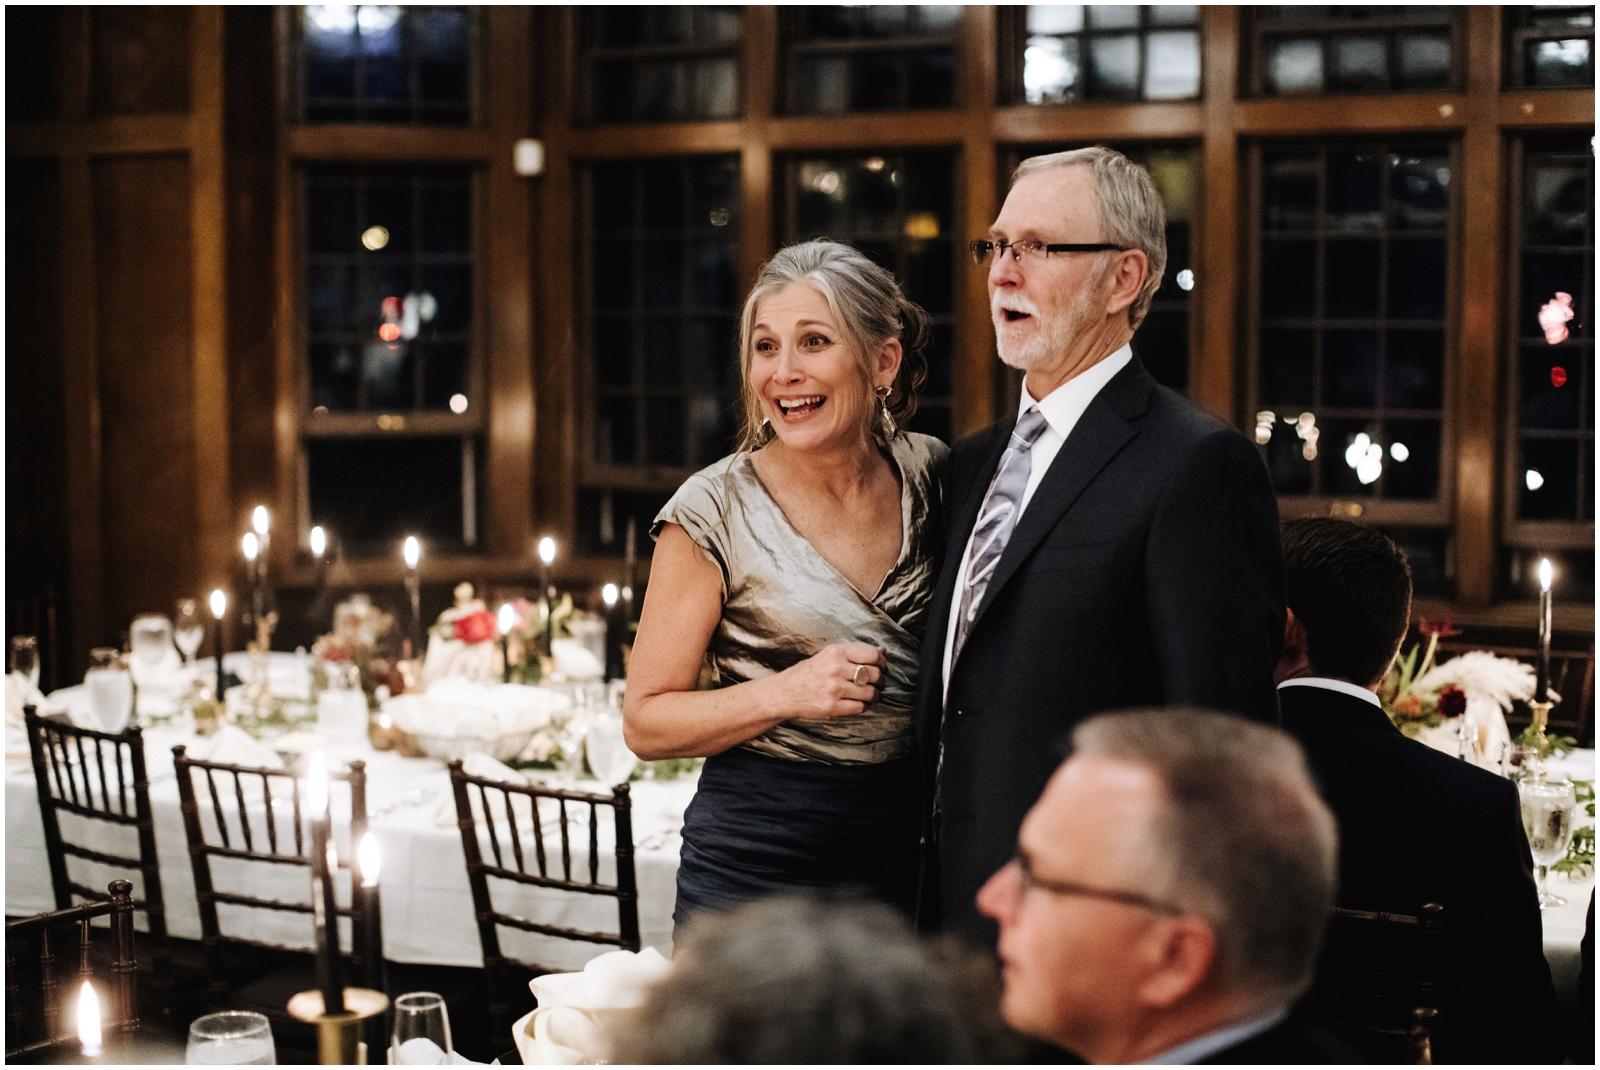 Minnesota Wedding Planner, Mpls Wedding Planner, Machine Shop MPLS, Mpls Wedding Venue.